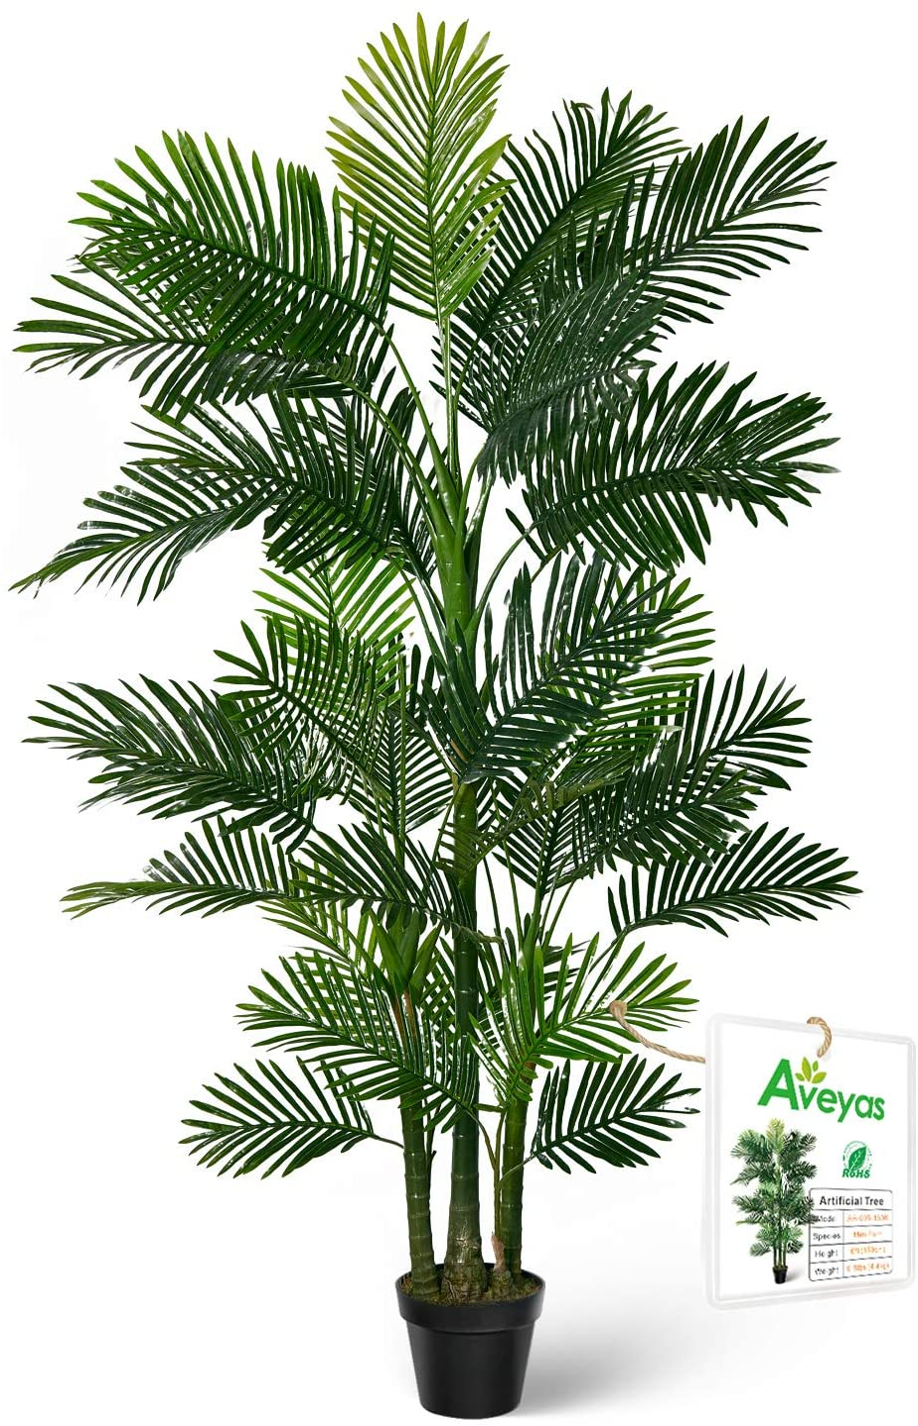 Lifelike Artificial Cycas Palm Phoenix palm Tree Fake Plastic Pot Office Decor